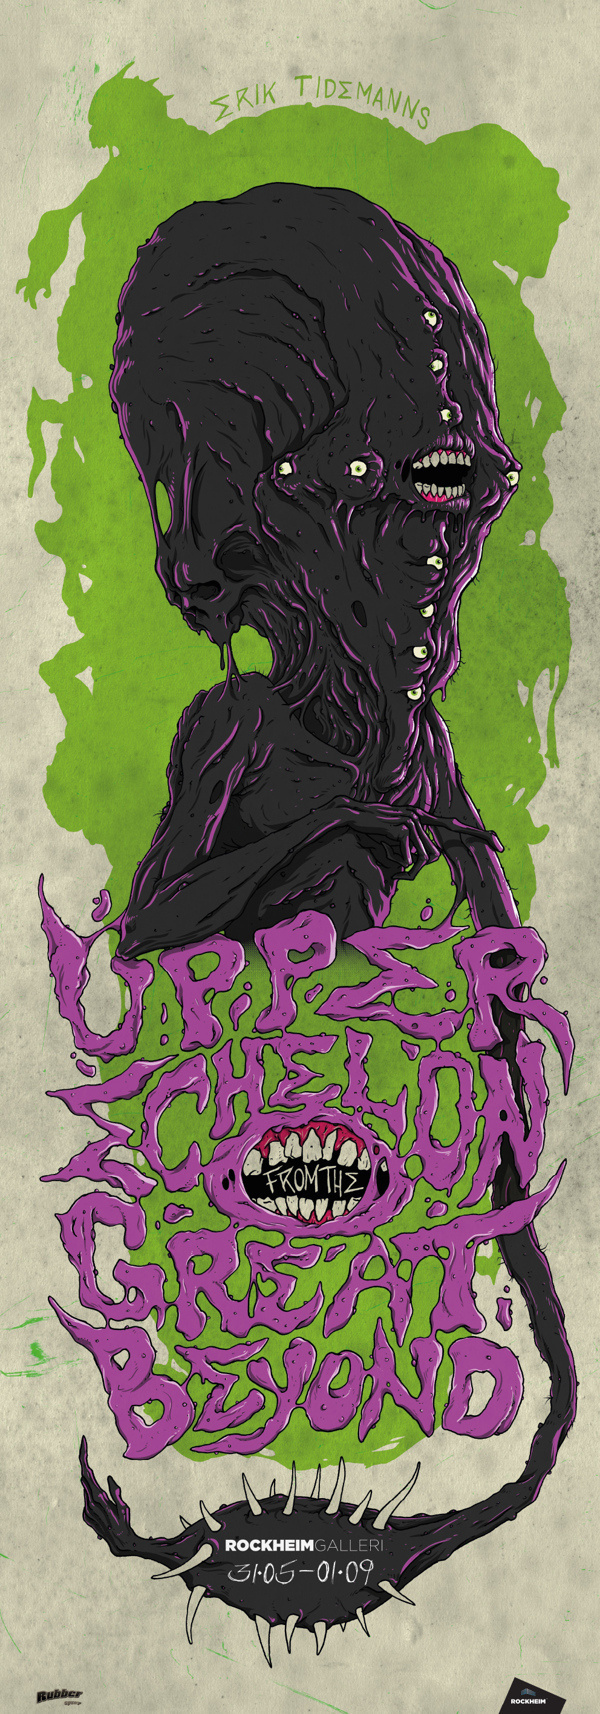 Upper Echelon from the Great Beyond on Behance #illustration #olav #sheim #typography